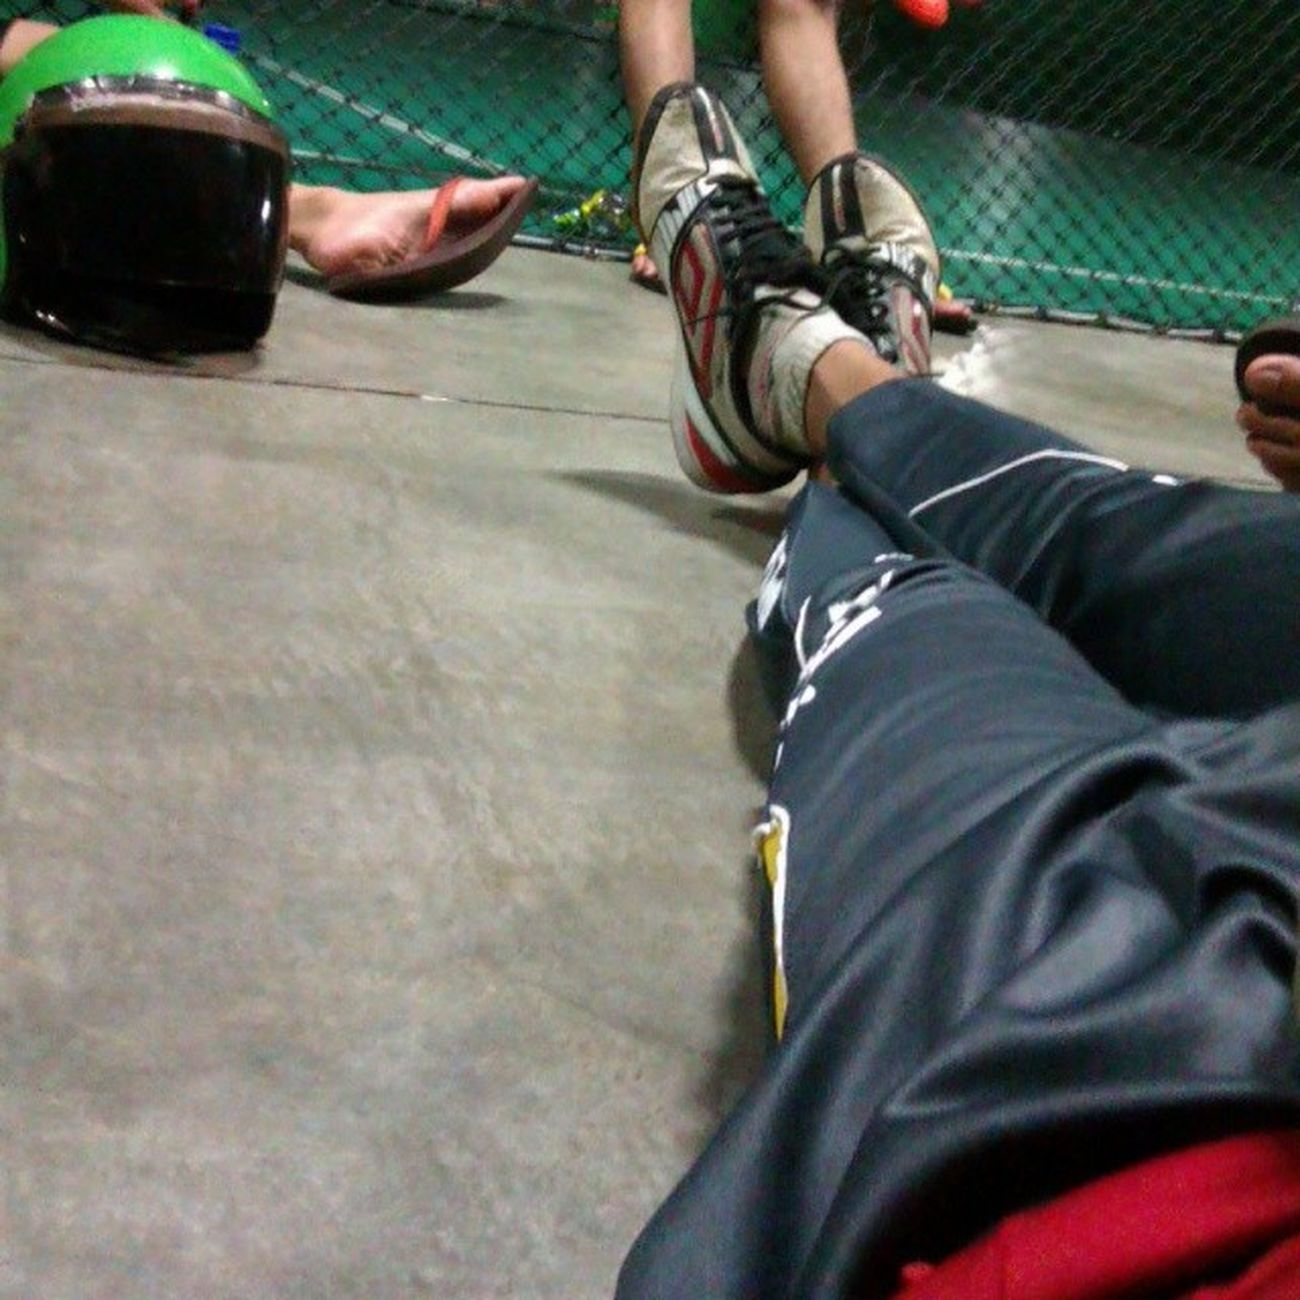 Penat men futsal ~ lepak court jea pown Court Futsal Umbro Challenger owhyeah